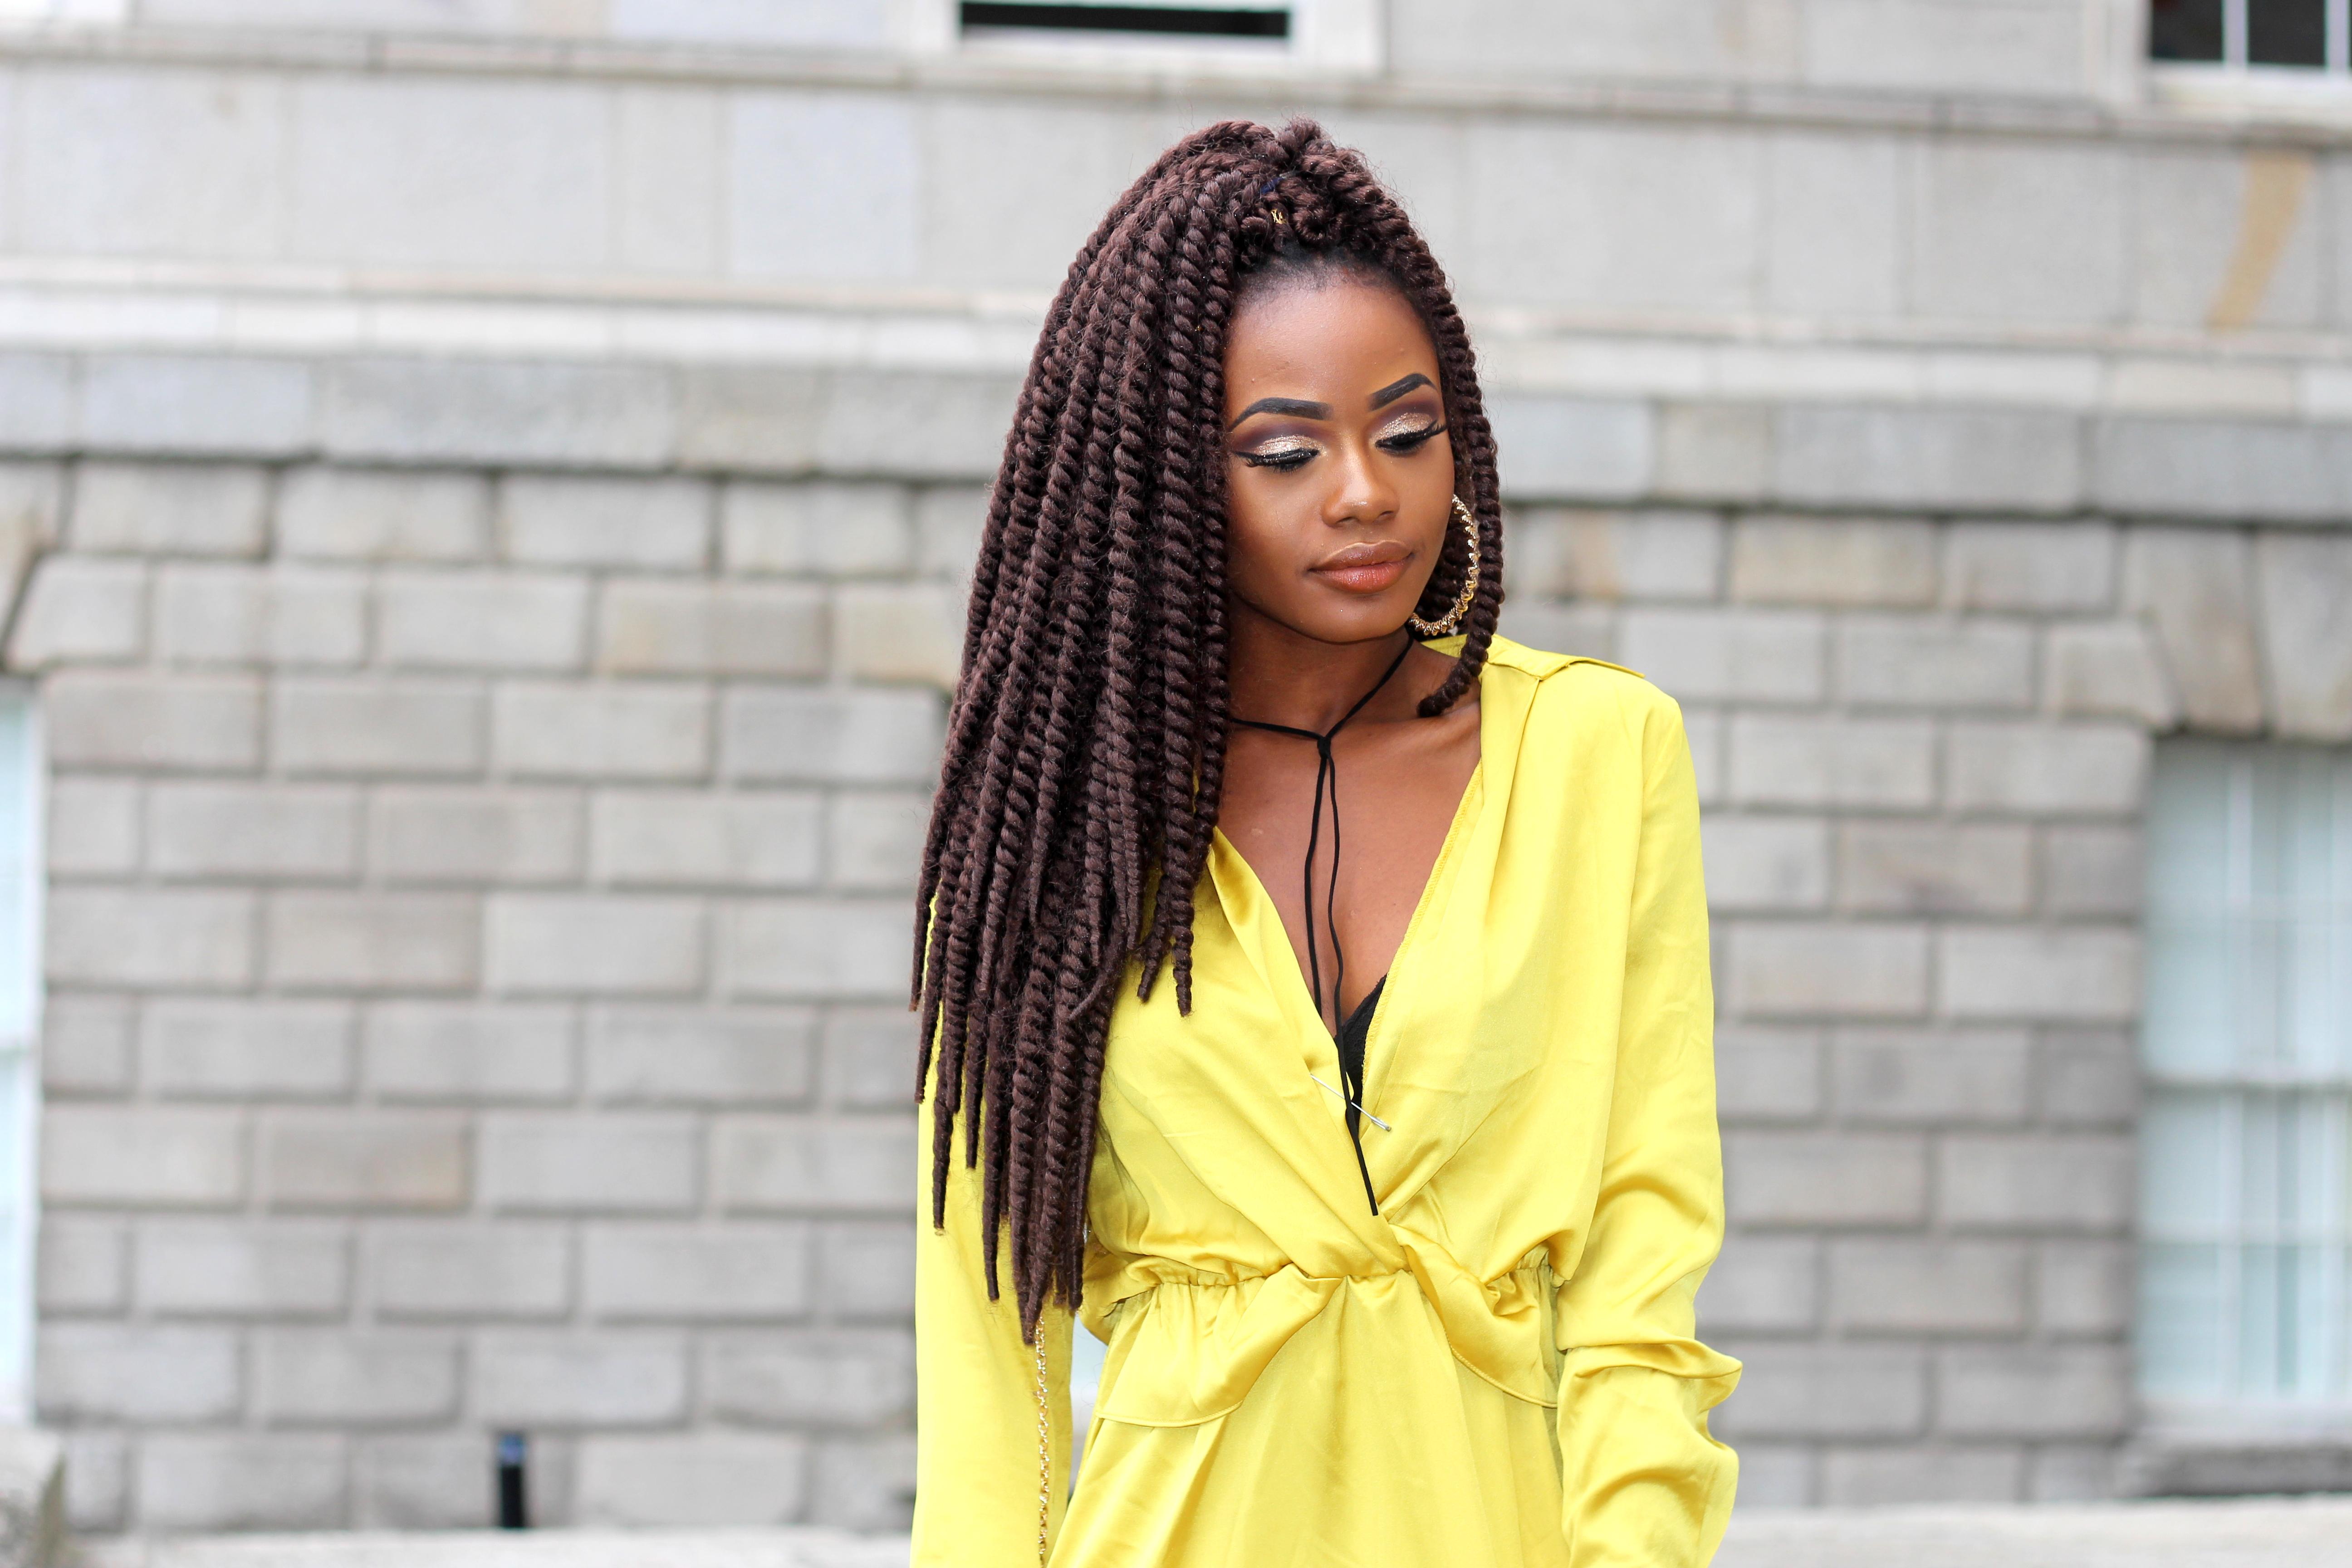 Billykiss Azeez - Your Favourite Muse - Beauty Blogger - Irish Nigerian. Crotchet Twist [Hair Breakdown]. Aliexpress Cheap Hair Review.